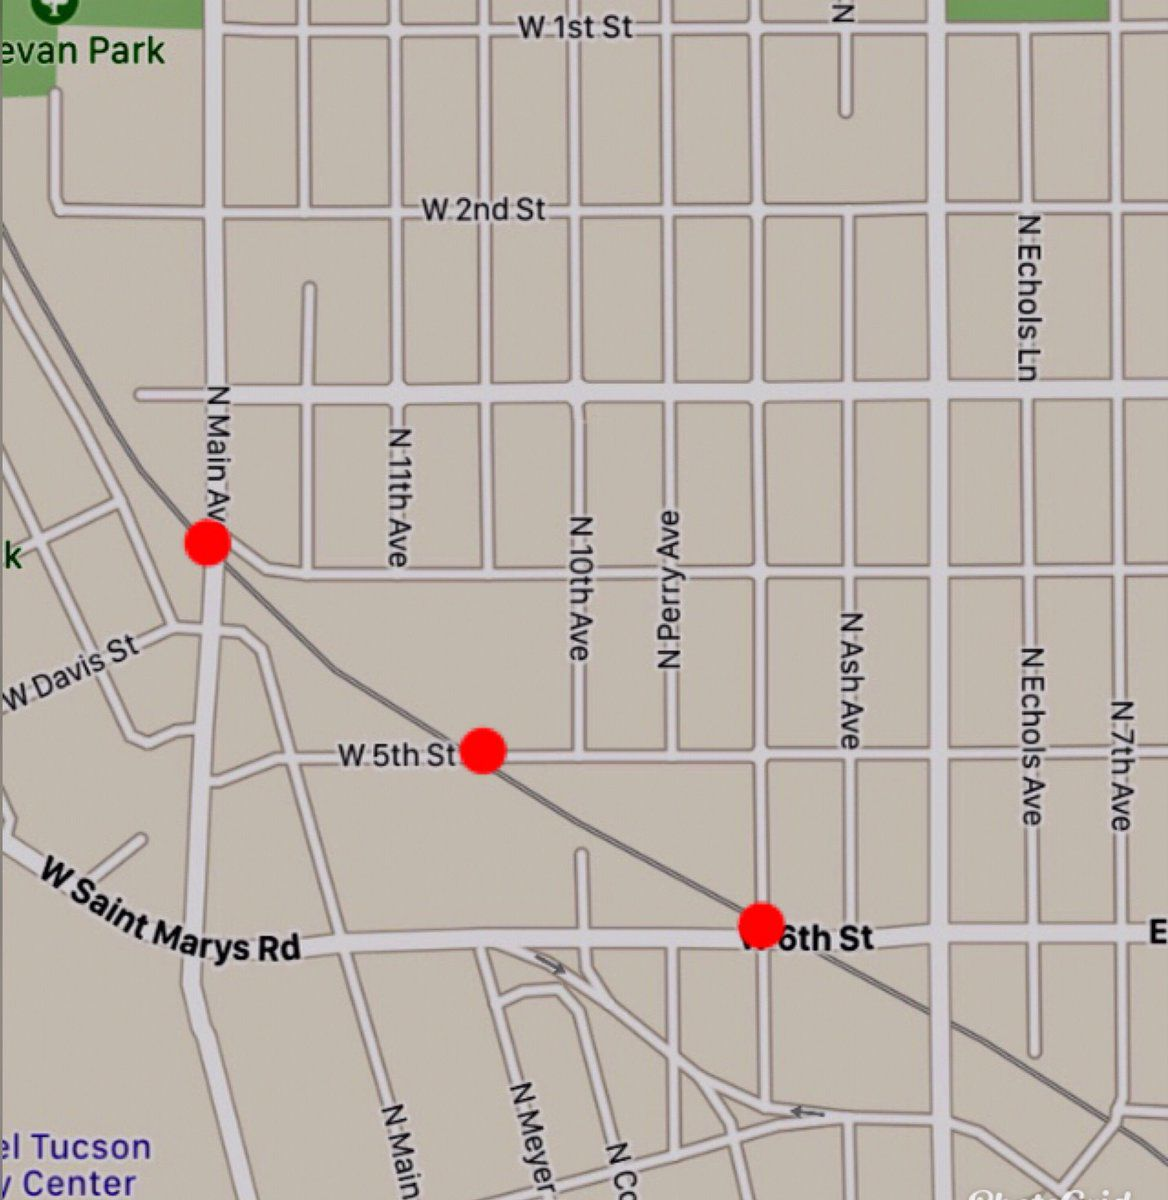 Roads reopen after train hits, kills Tucson pedestrian | Tucson.com